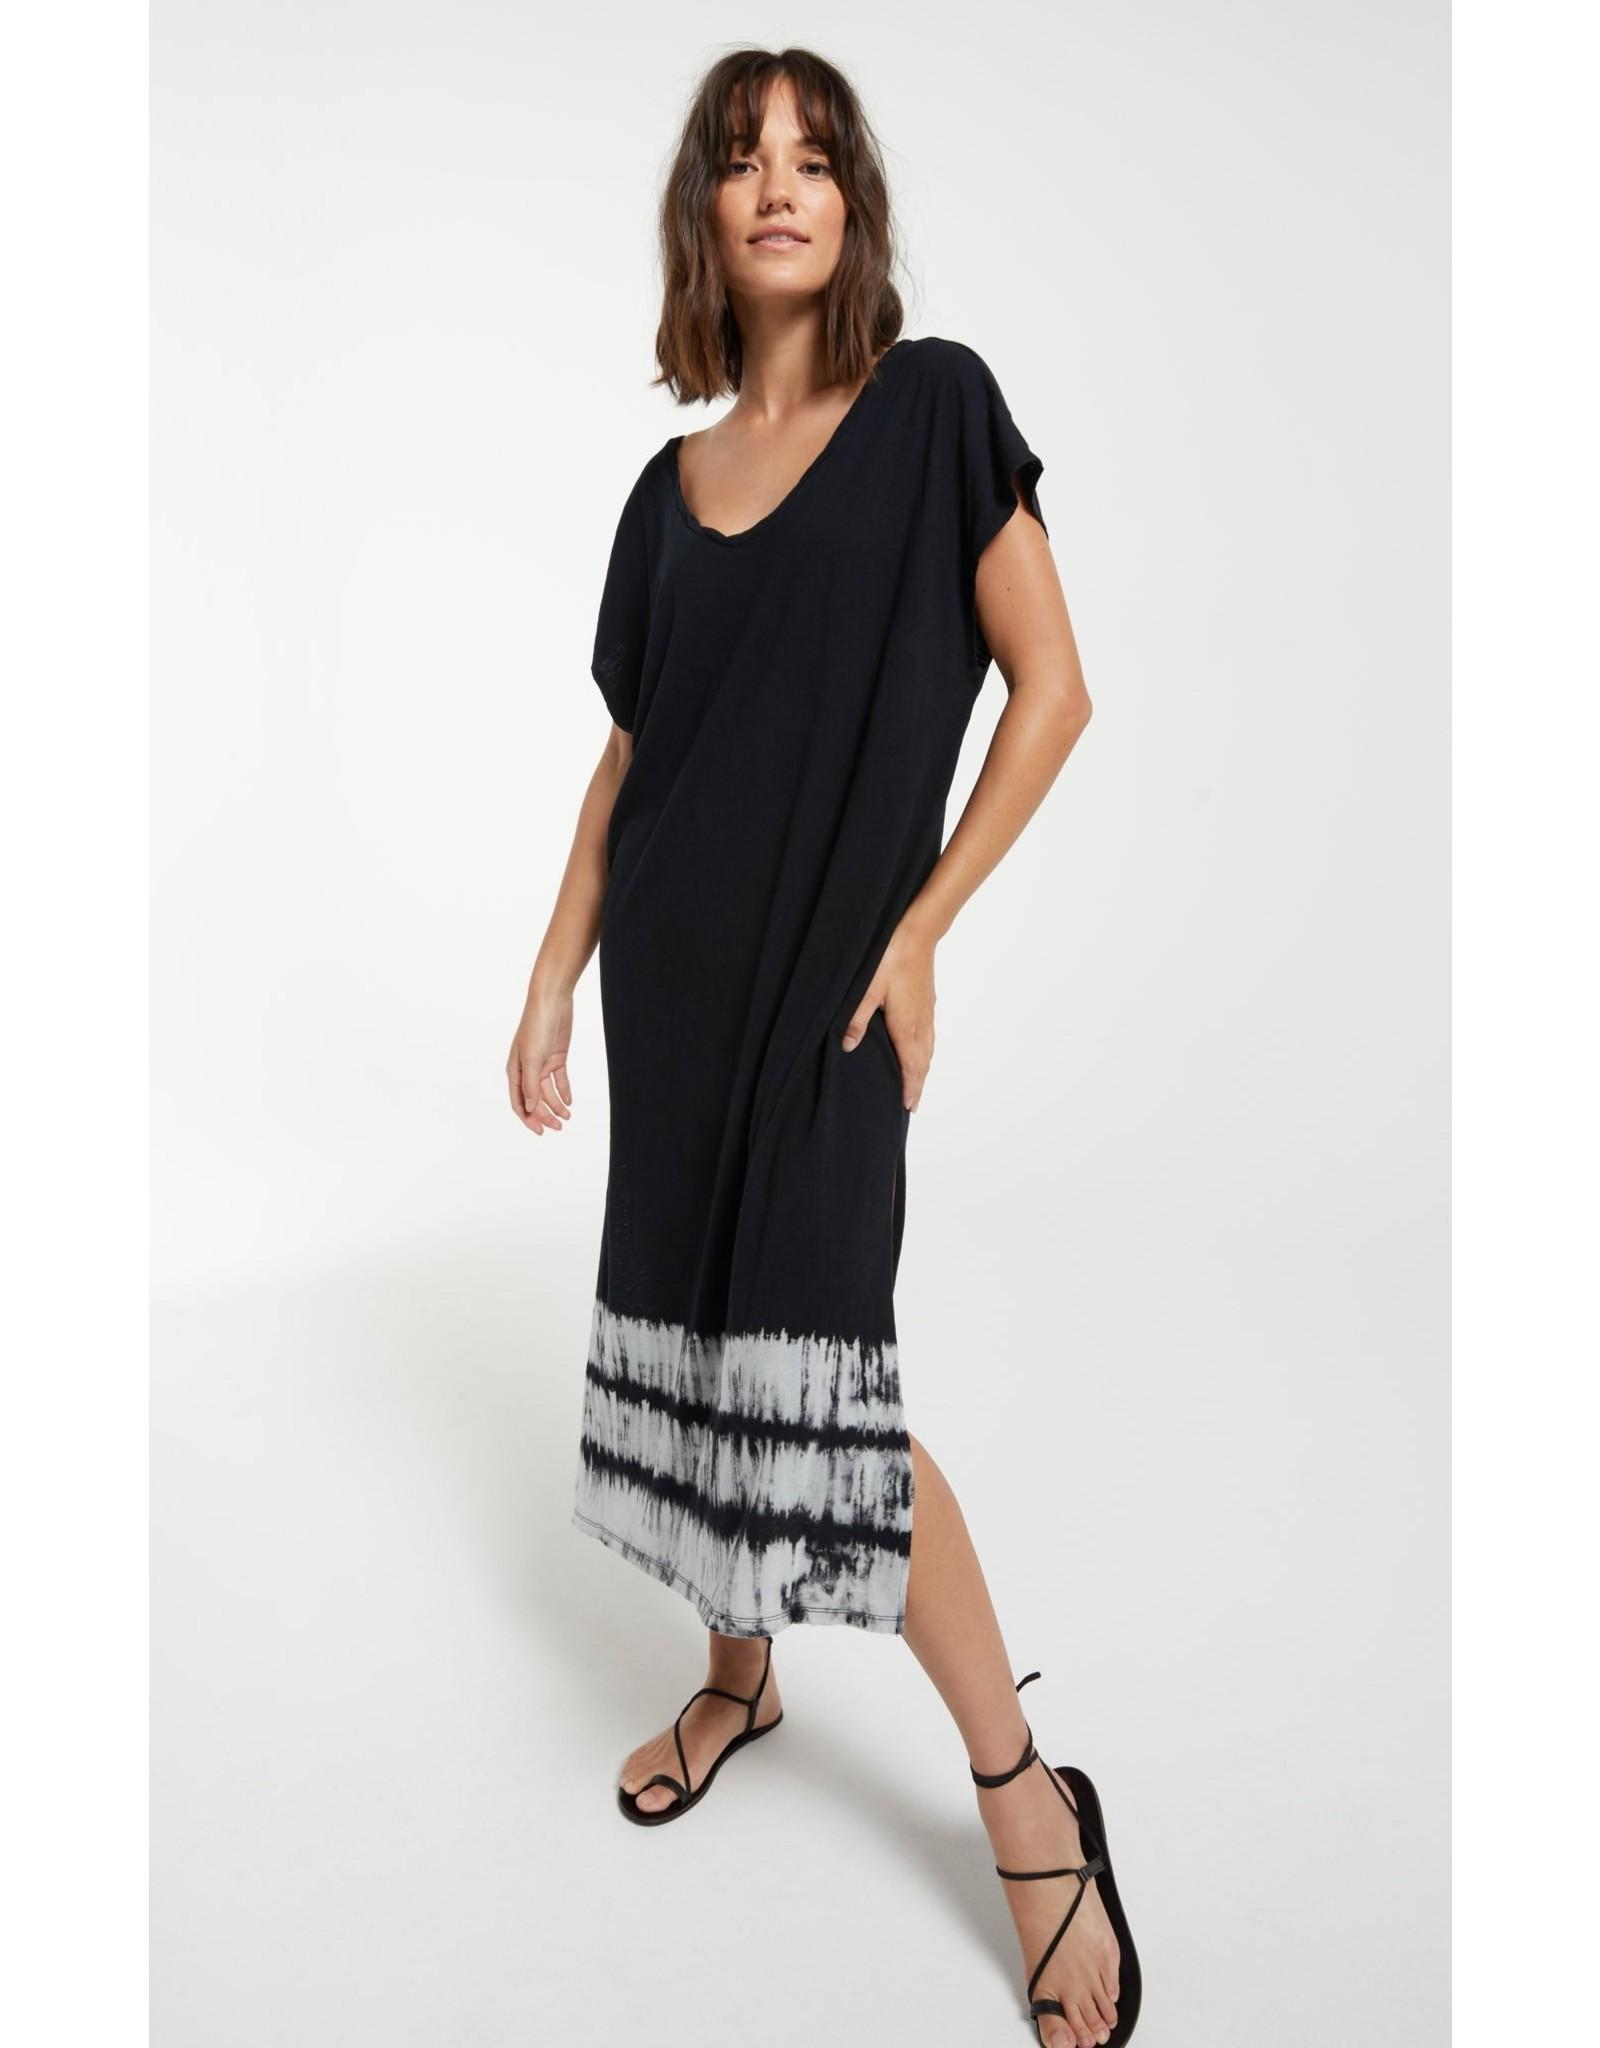 Z-Supply Eden Stripe Dress